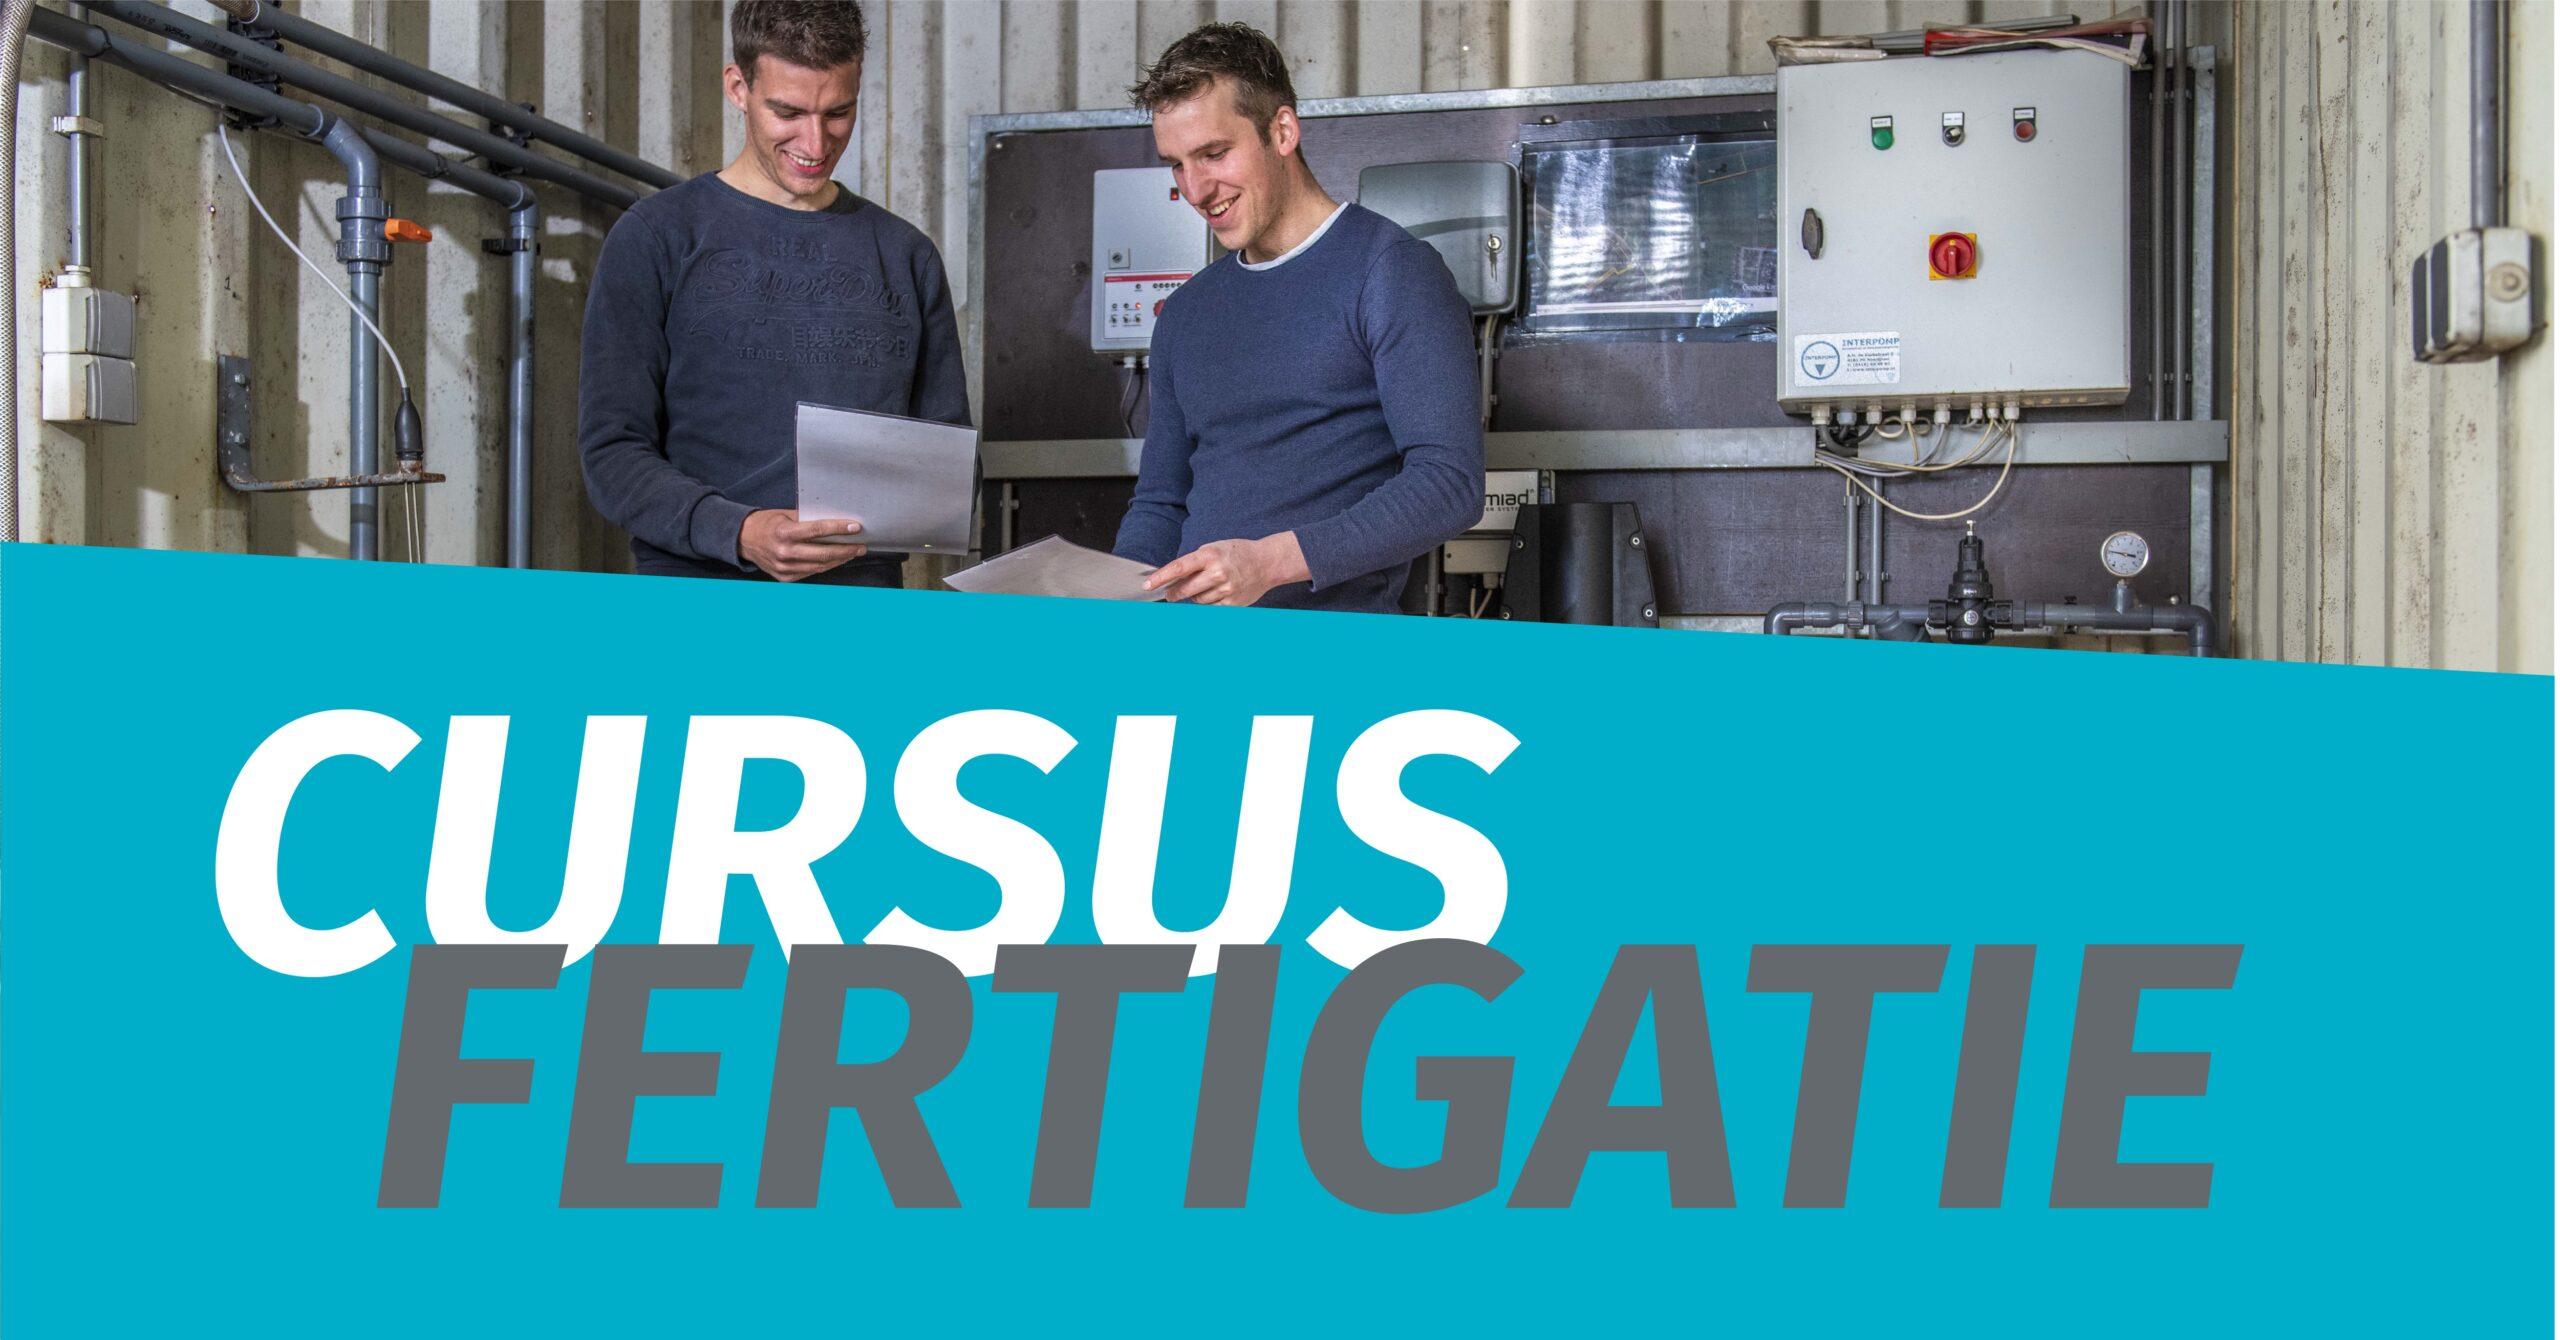 Curus Fertigatie_website-04